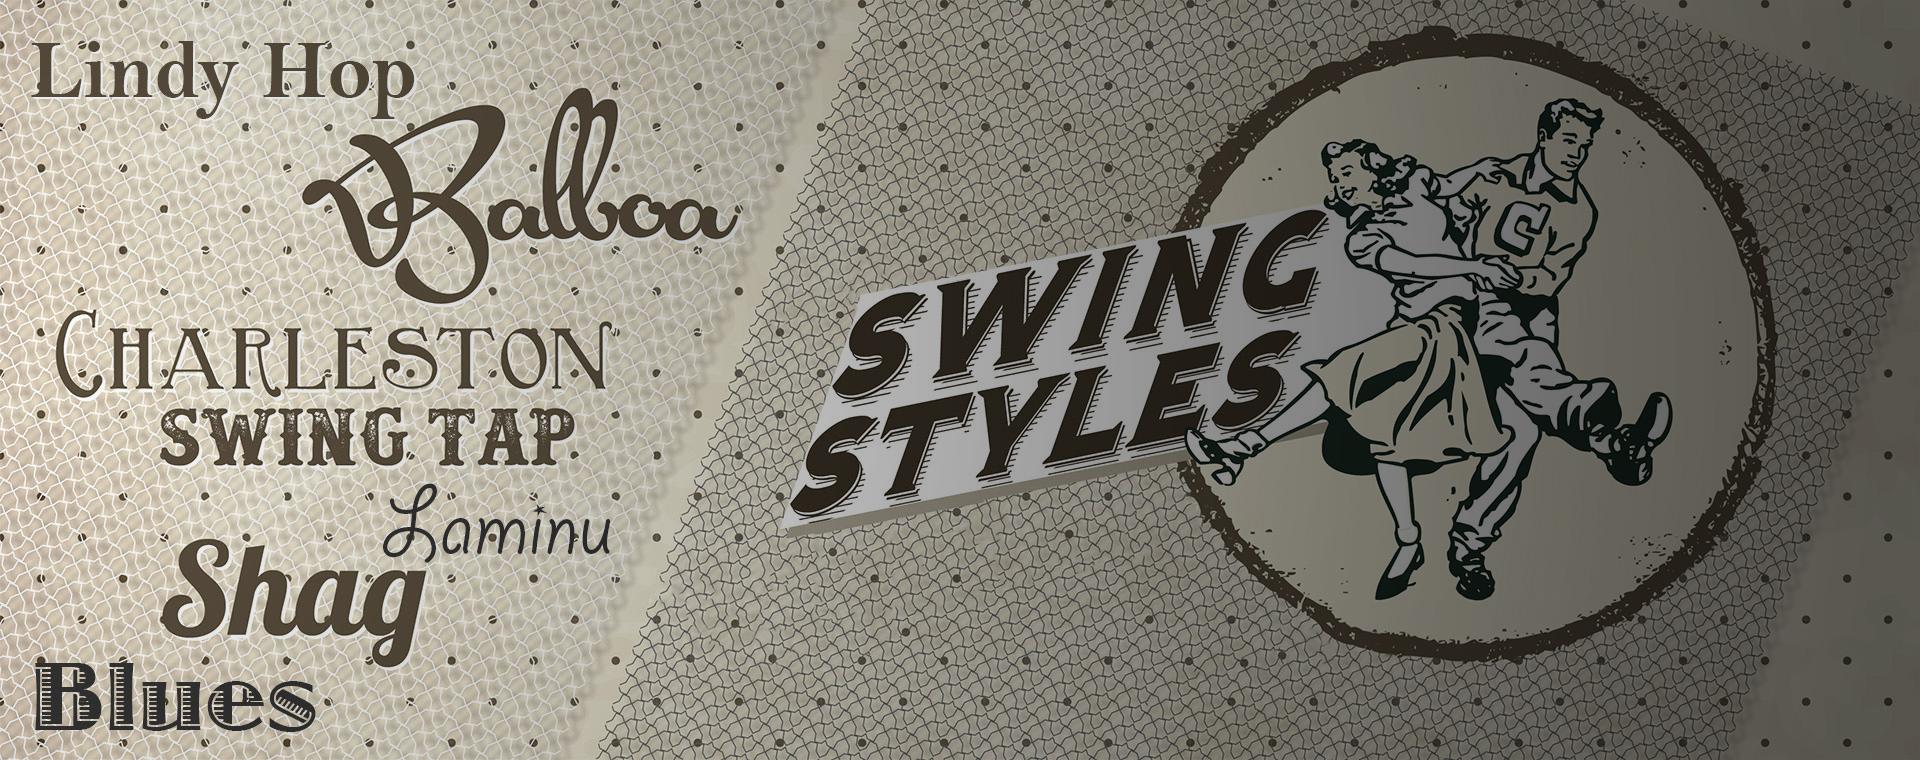 Swing-Styles-Every-Sunday-Badeschiff